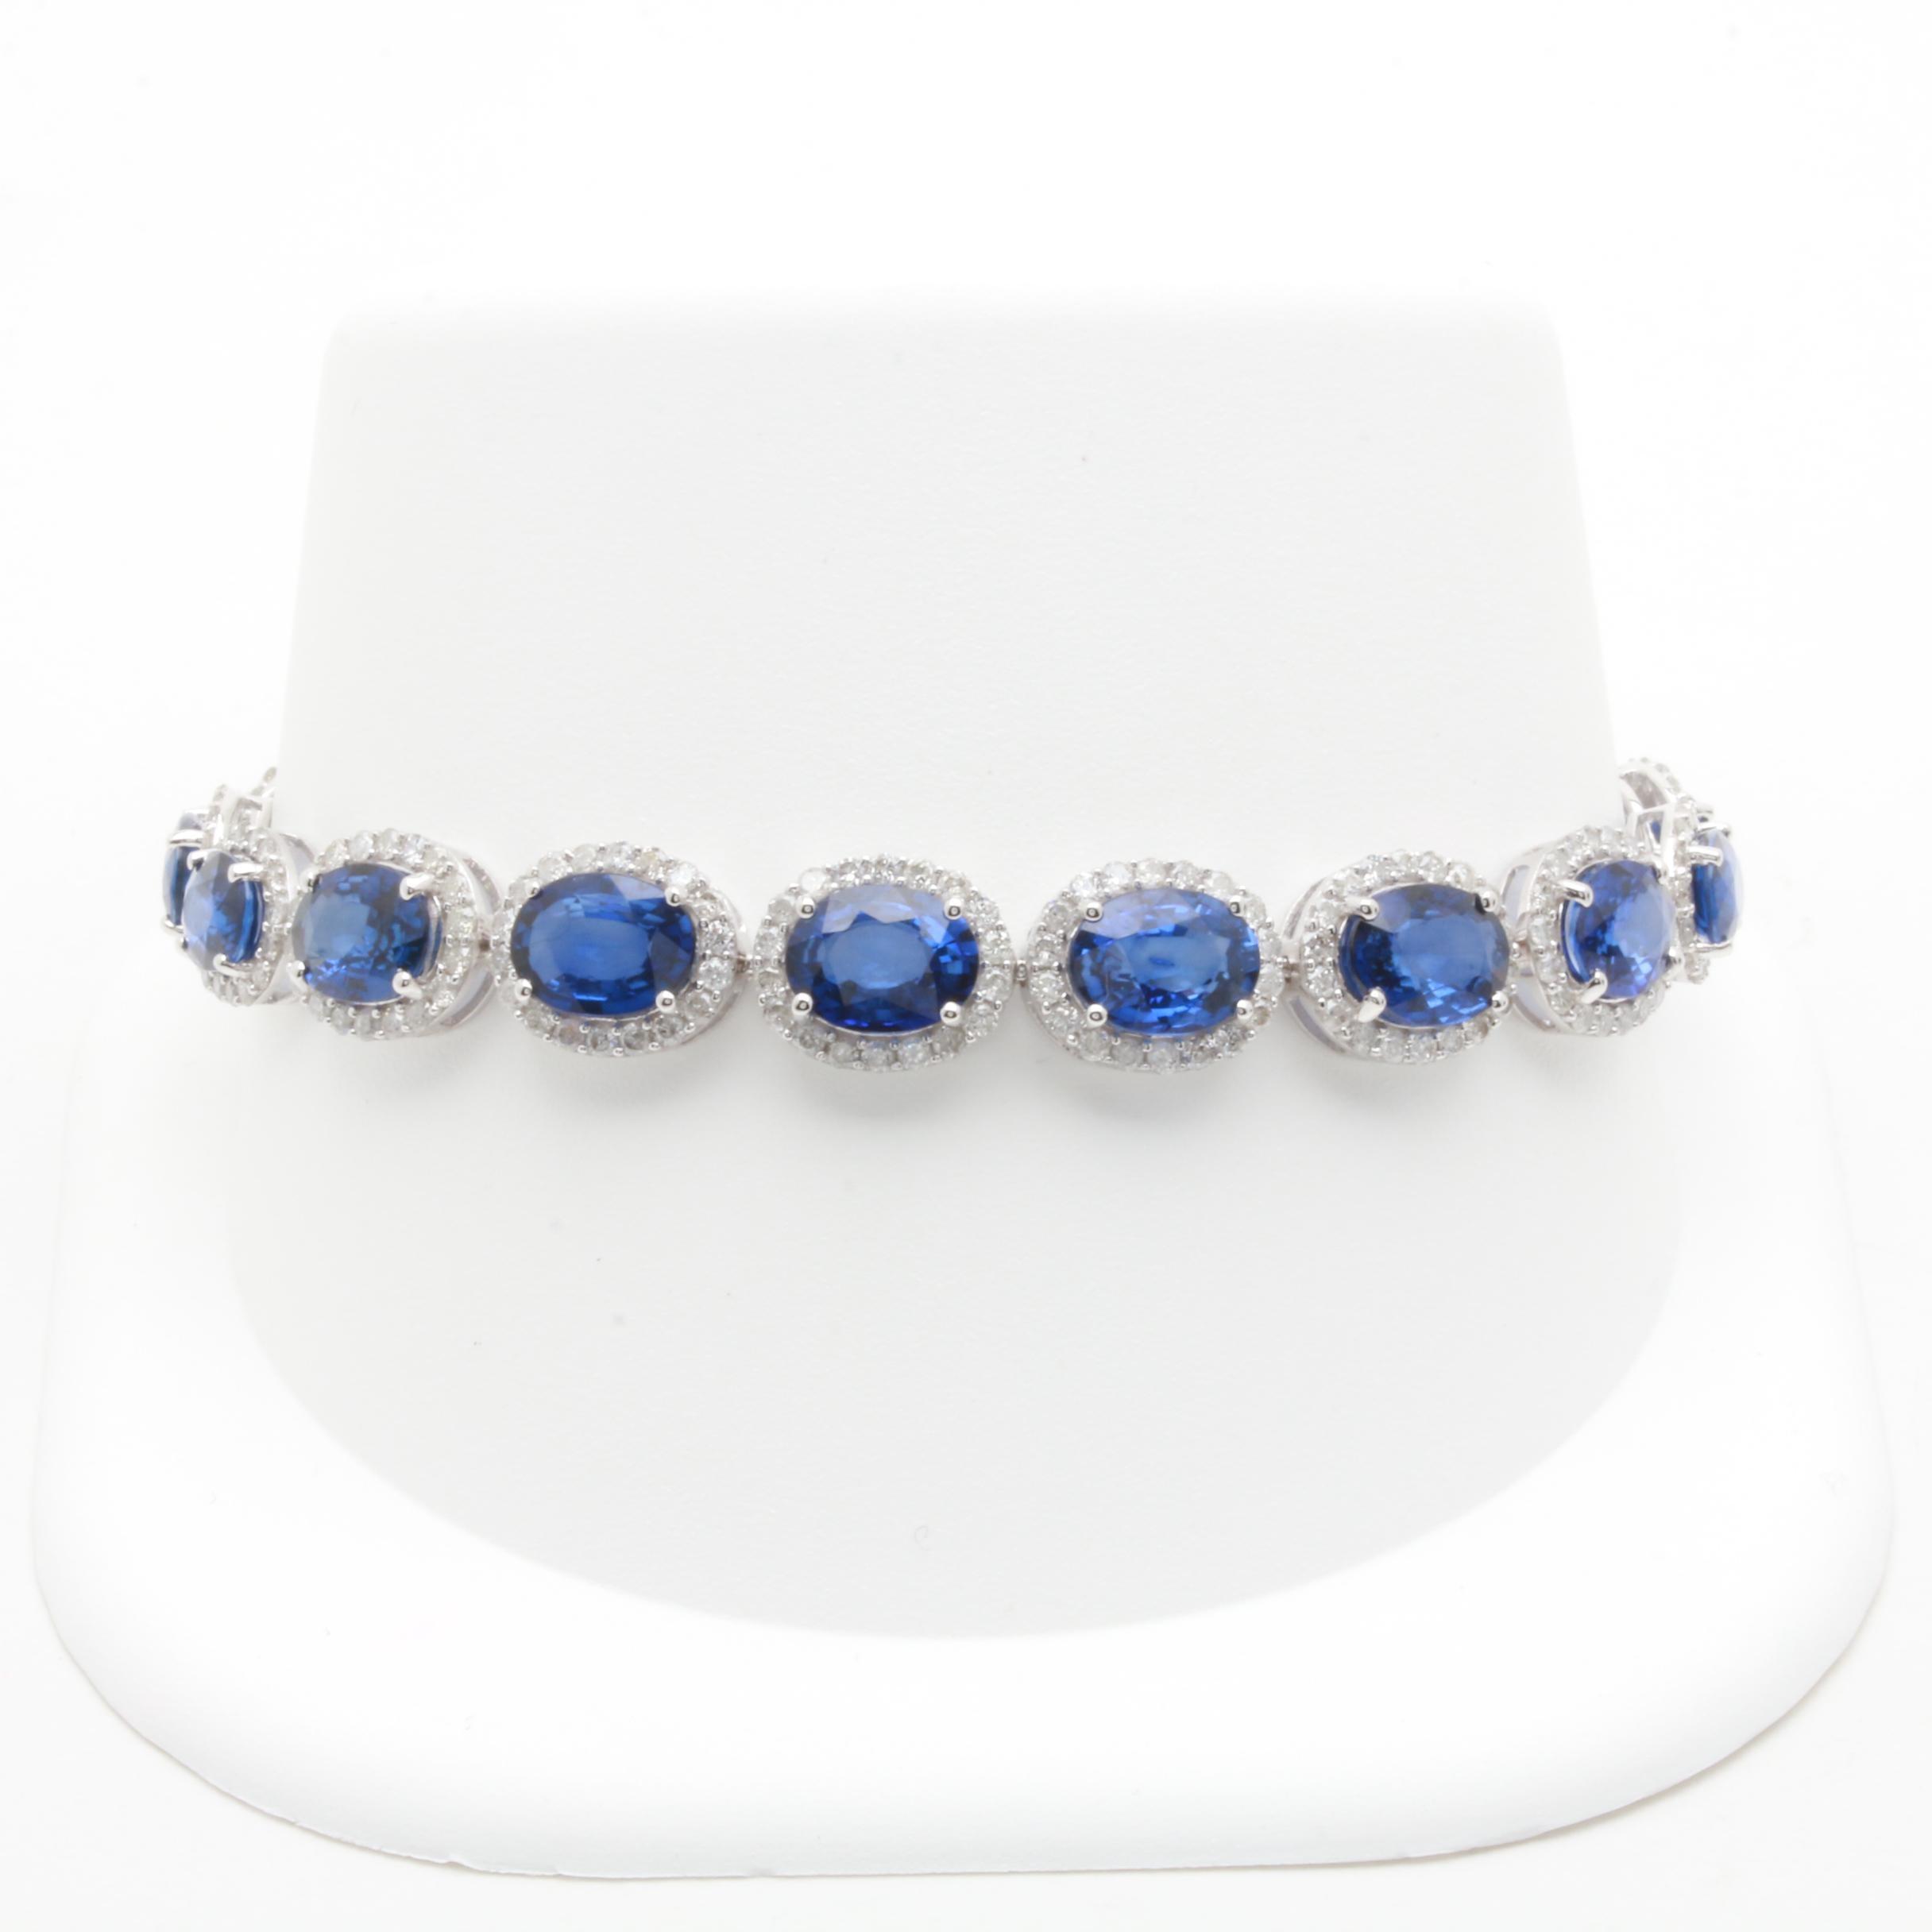 14K White Gold Sapphire and 2.93 CTW Diamond Link Bracelet